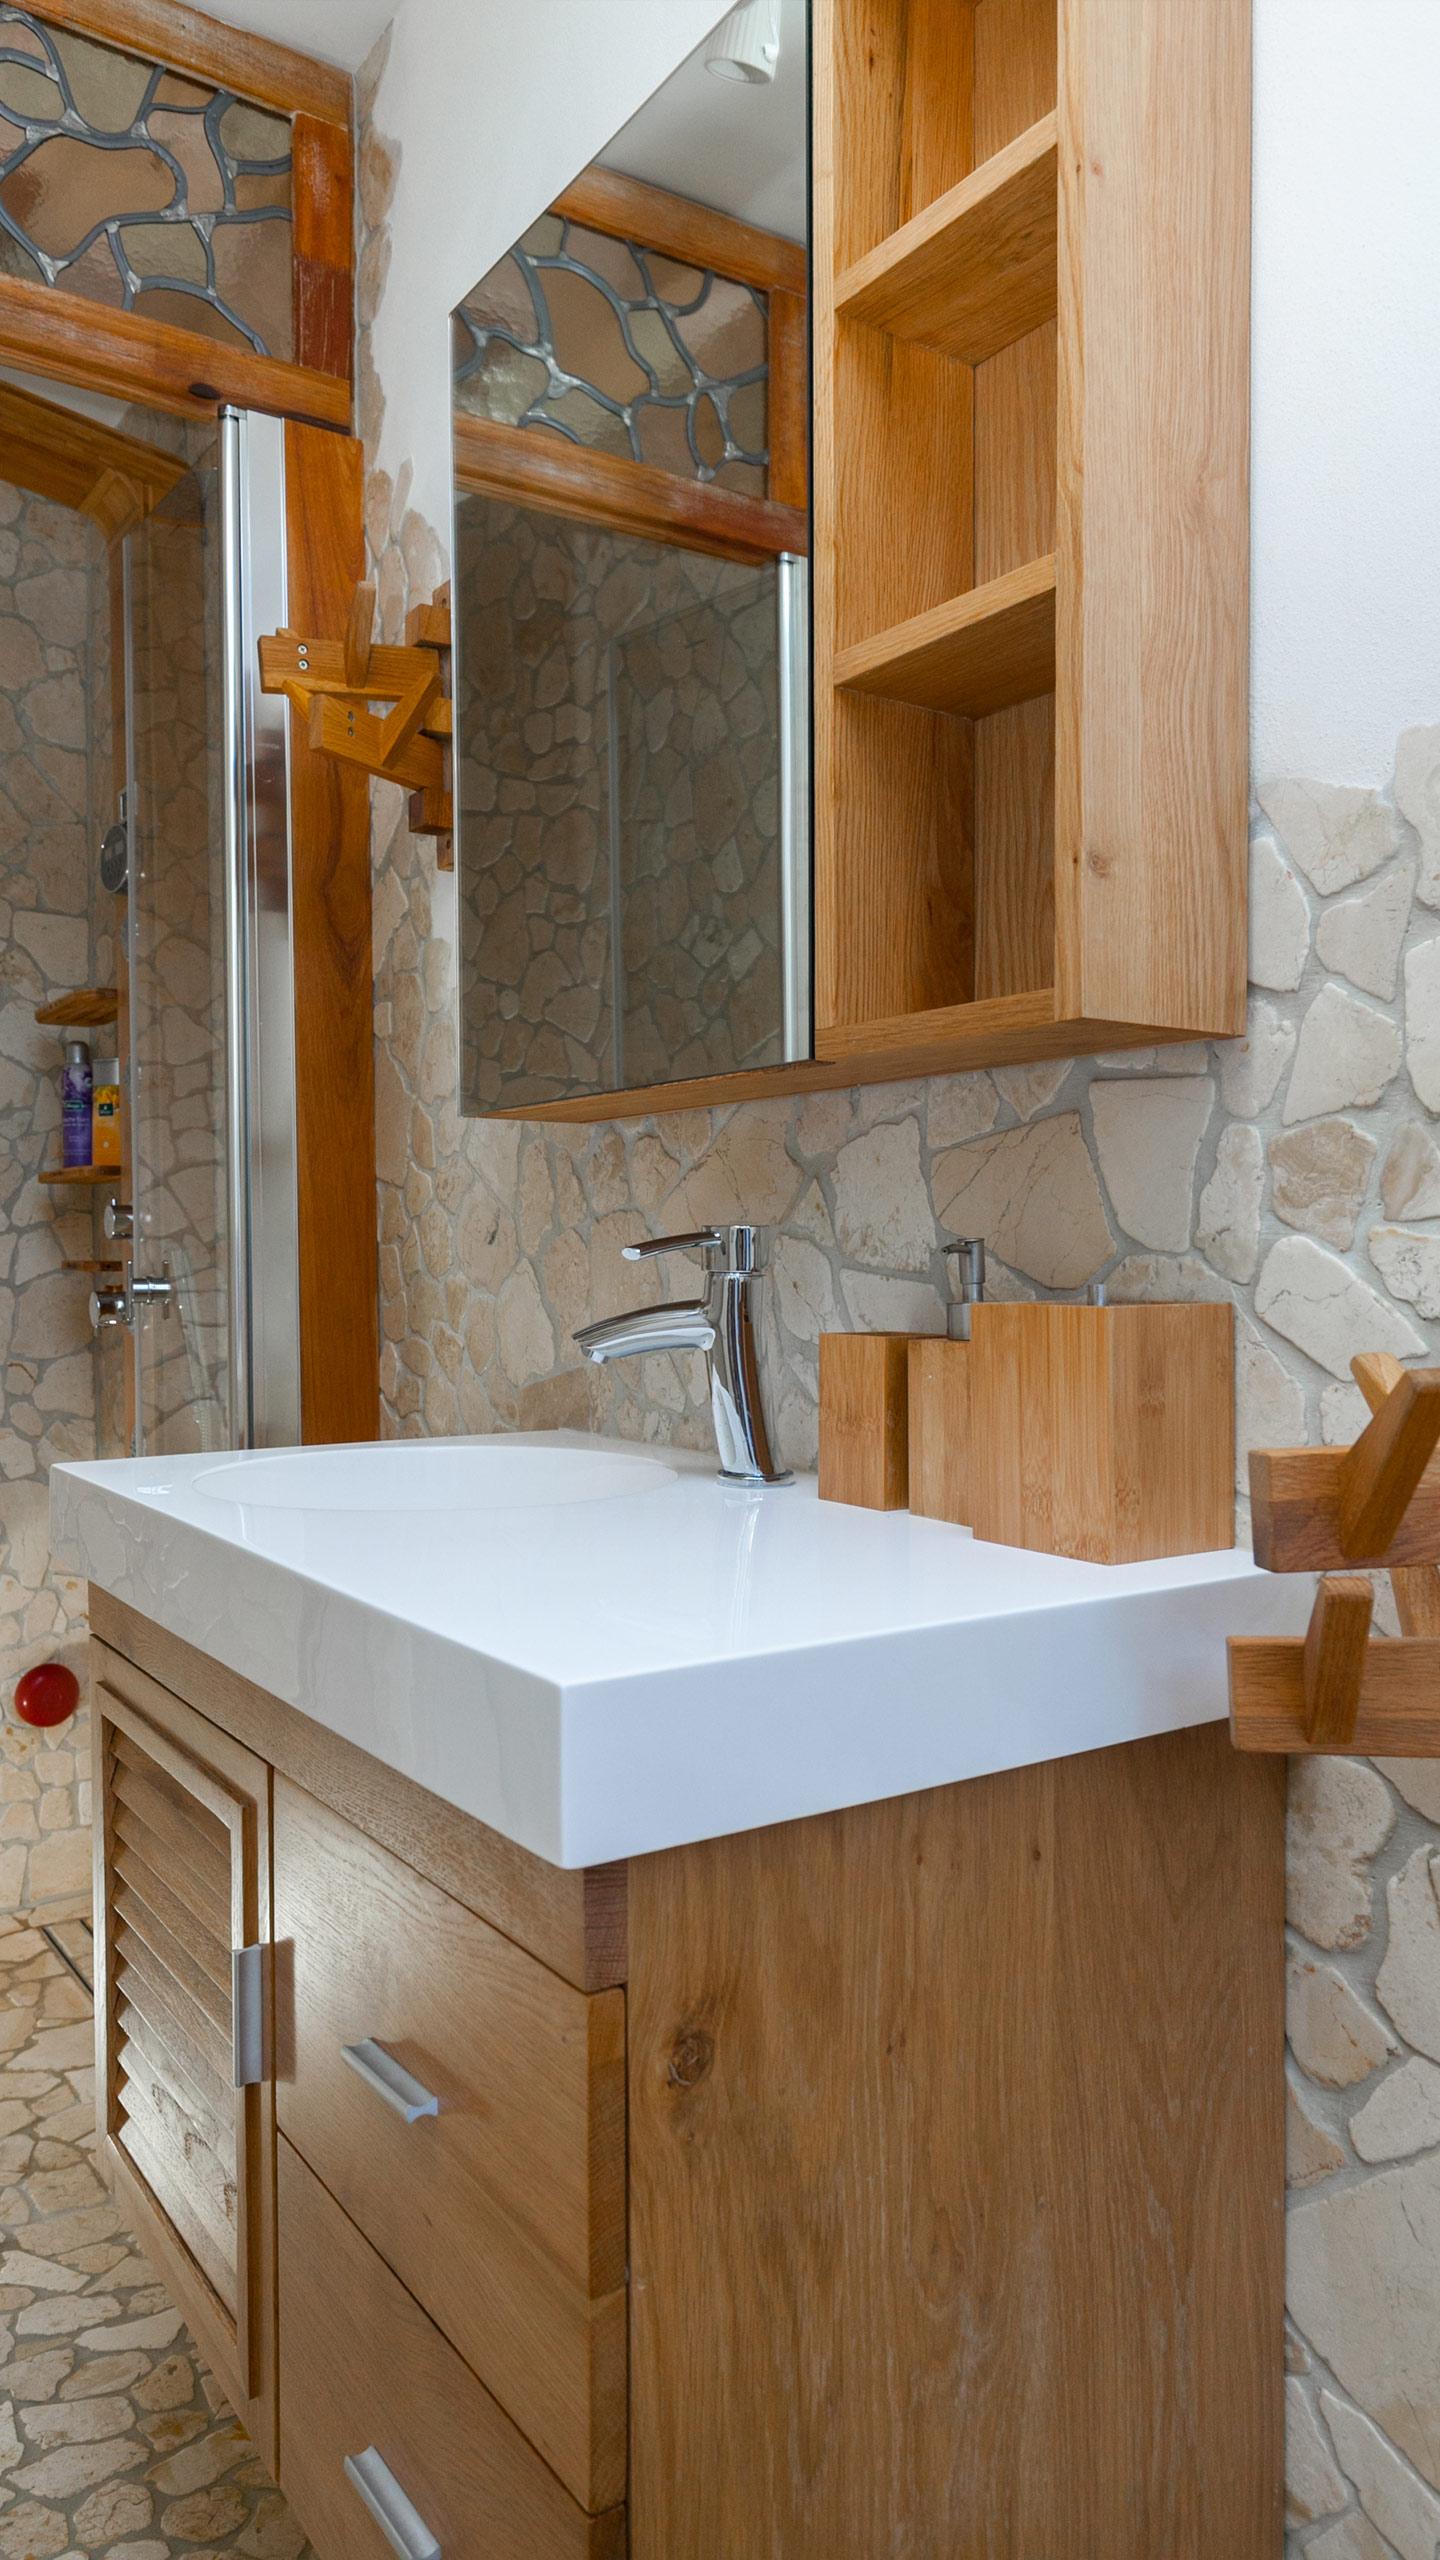 Residential - City apartment, Ebro white floated plaster